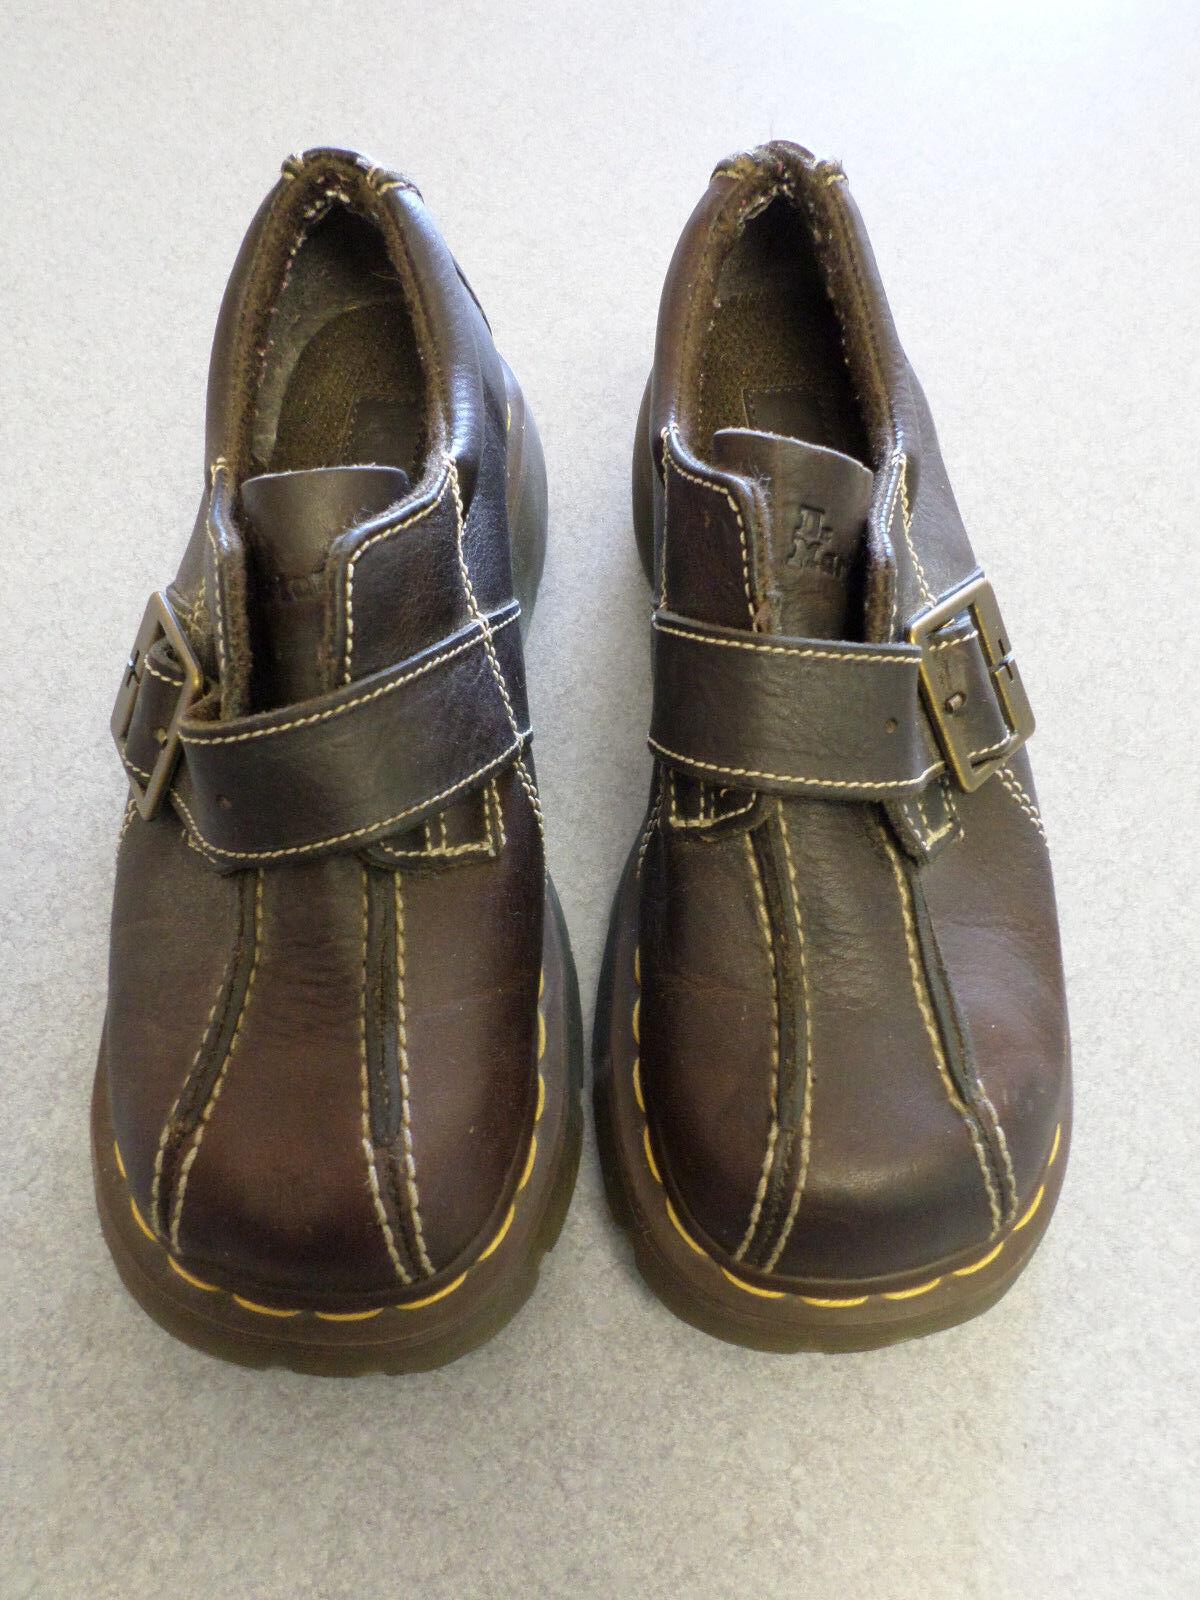 Dr. Doc Martens dark brown leather, buckle oxfords. Women's 6 (euro 37)